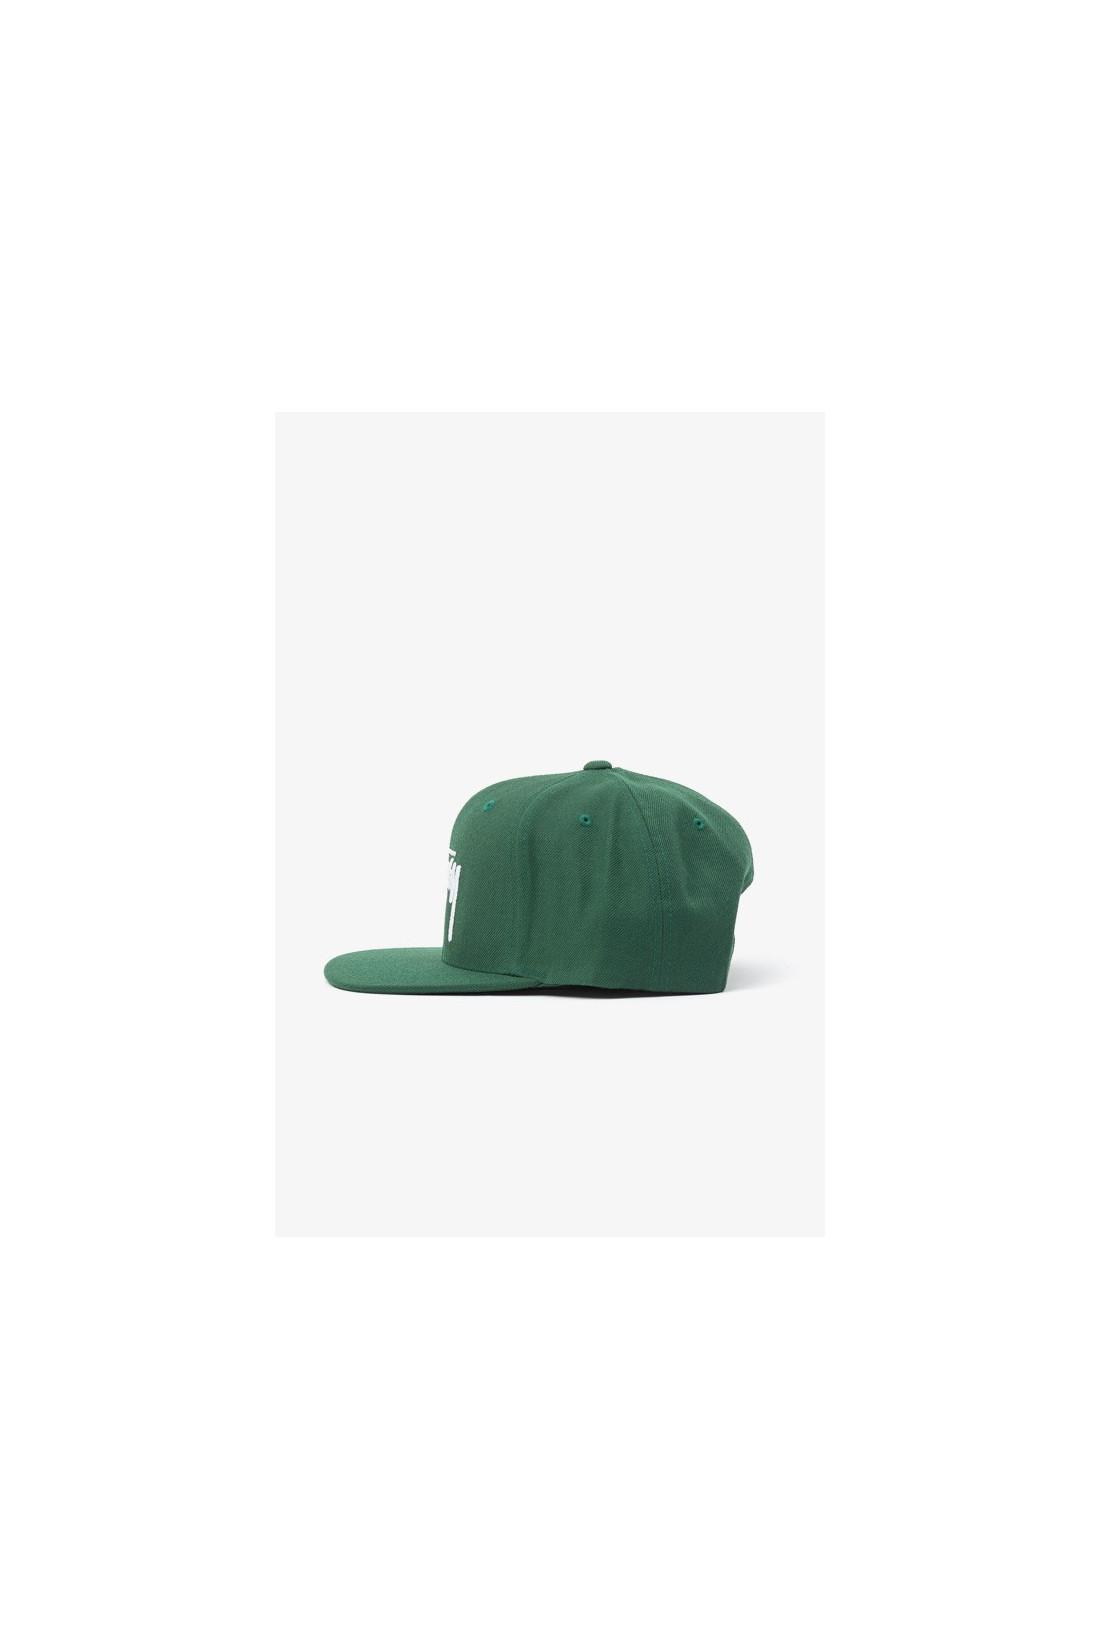 STUSSY / Stock cap Green